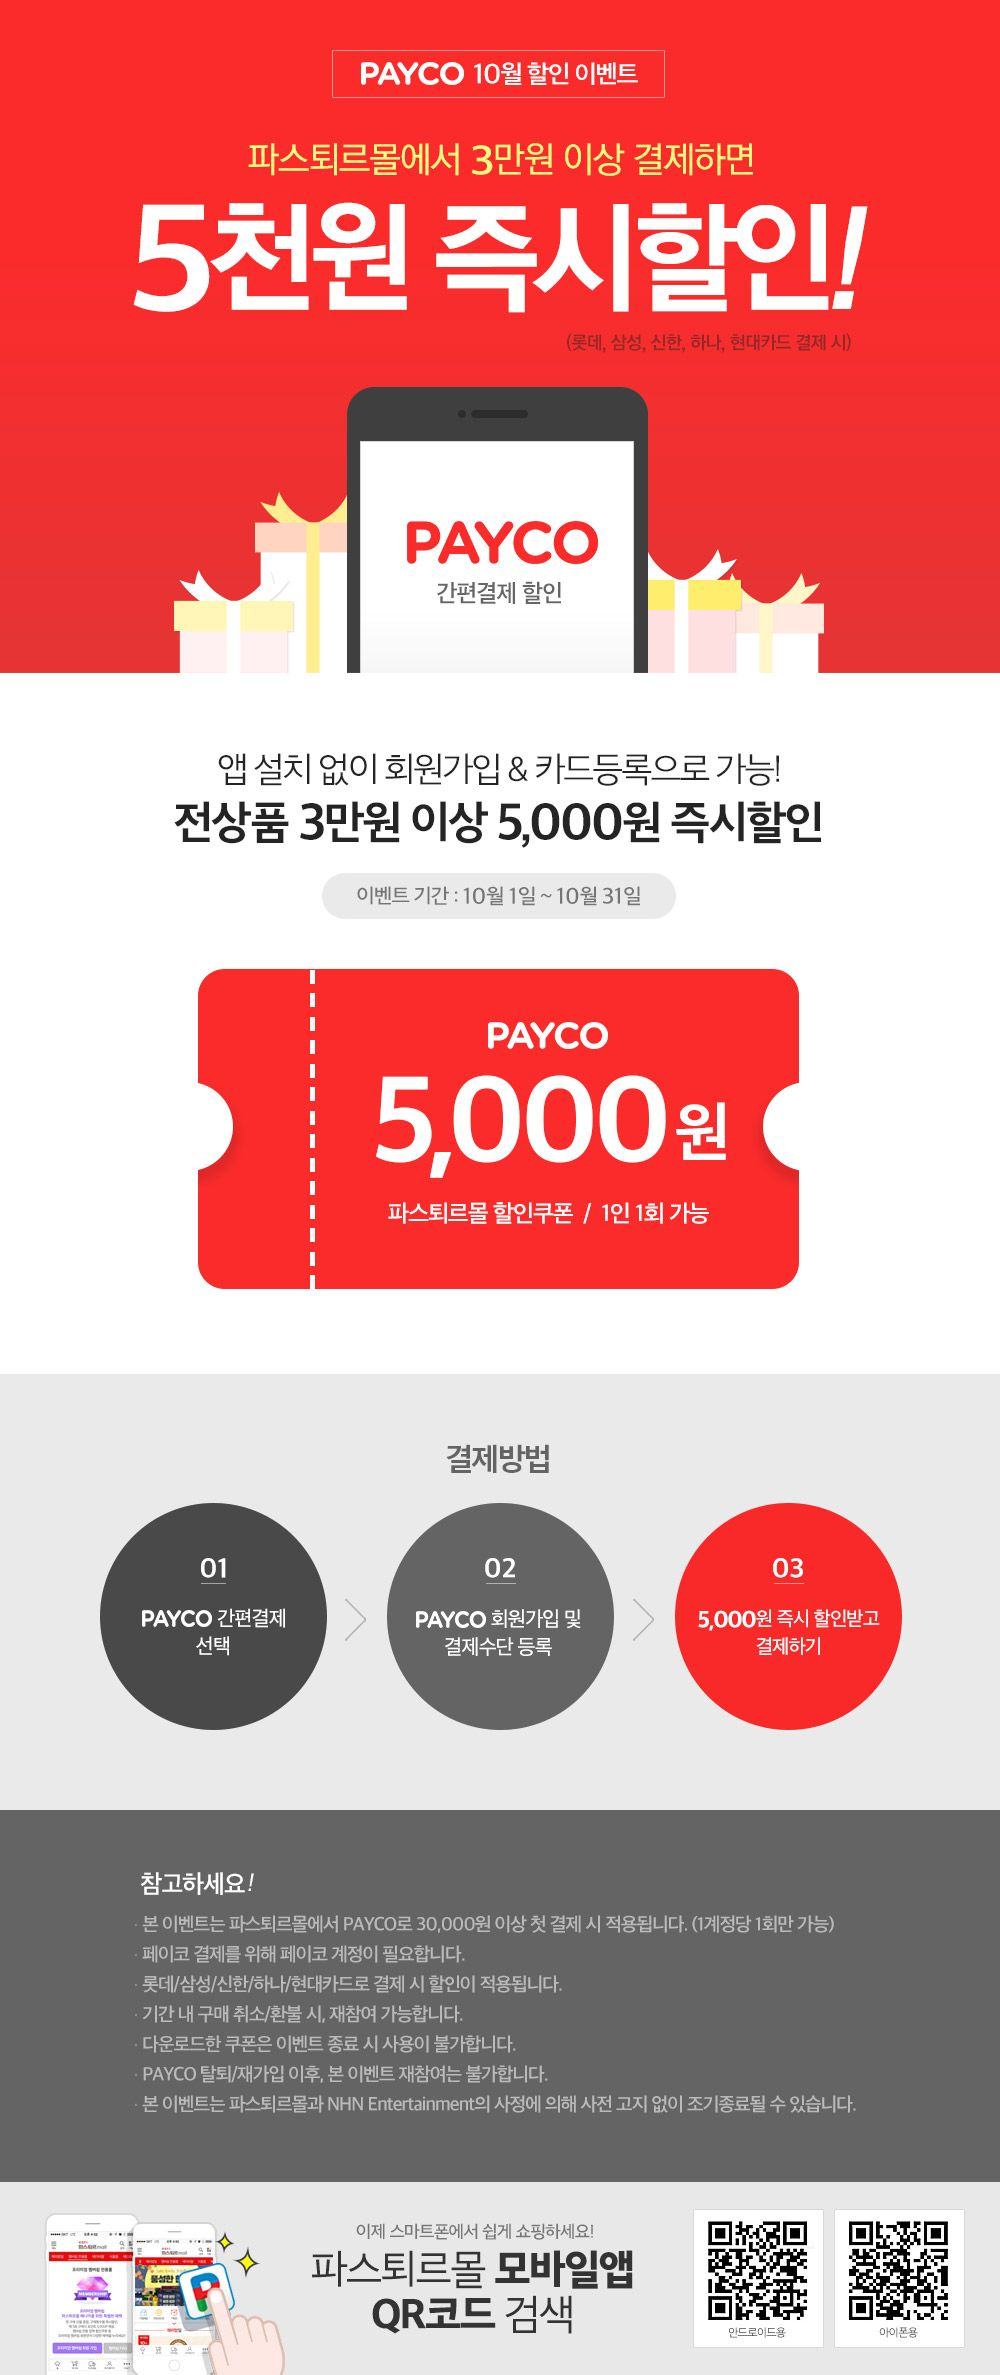 2015.10. PAYCO 할인 이벤트